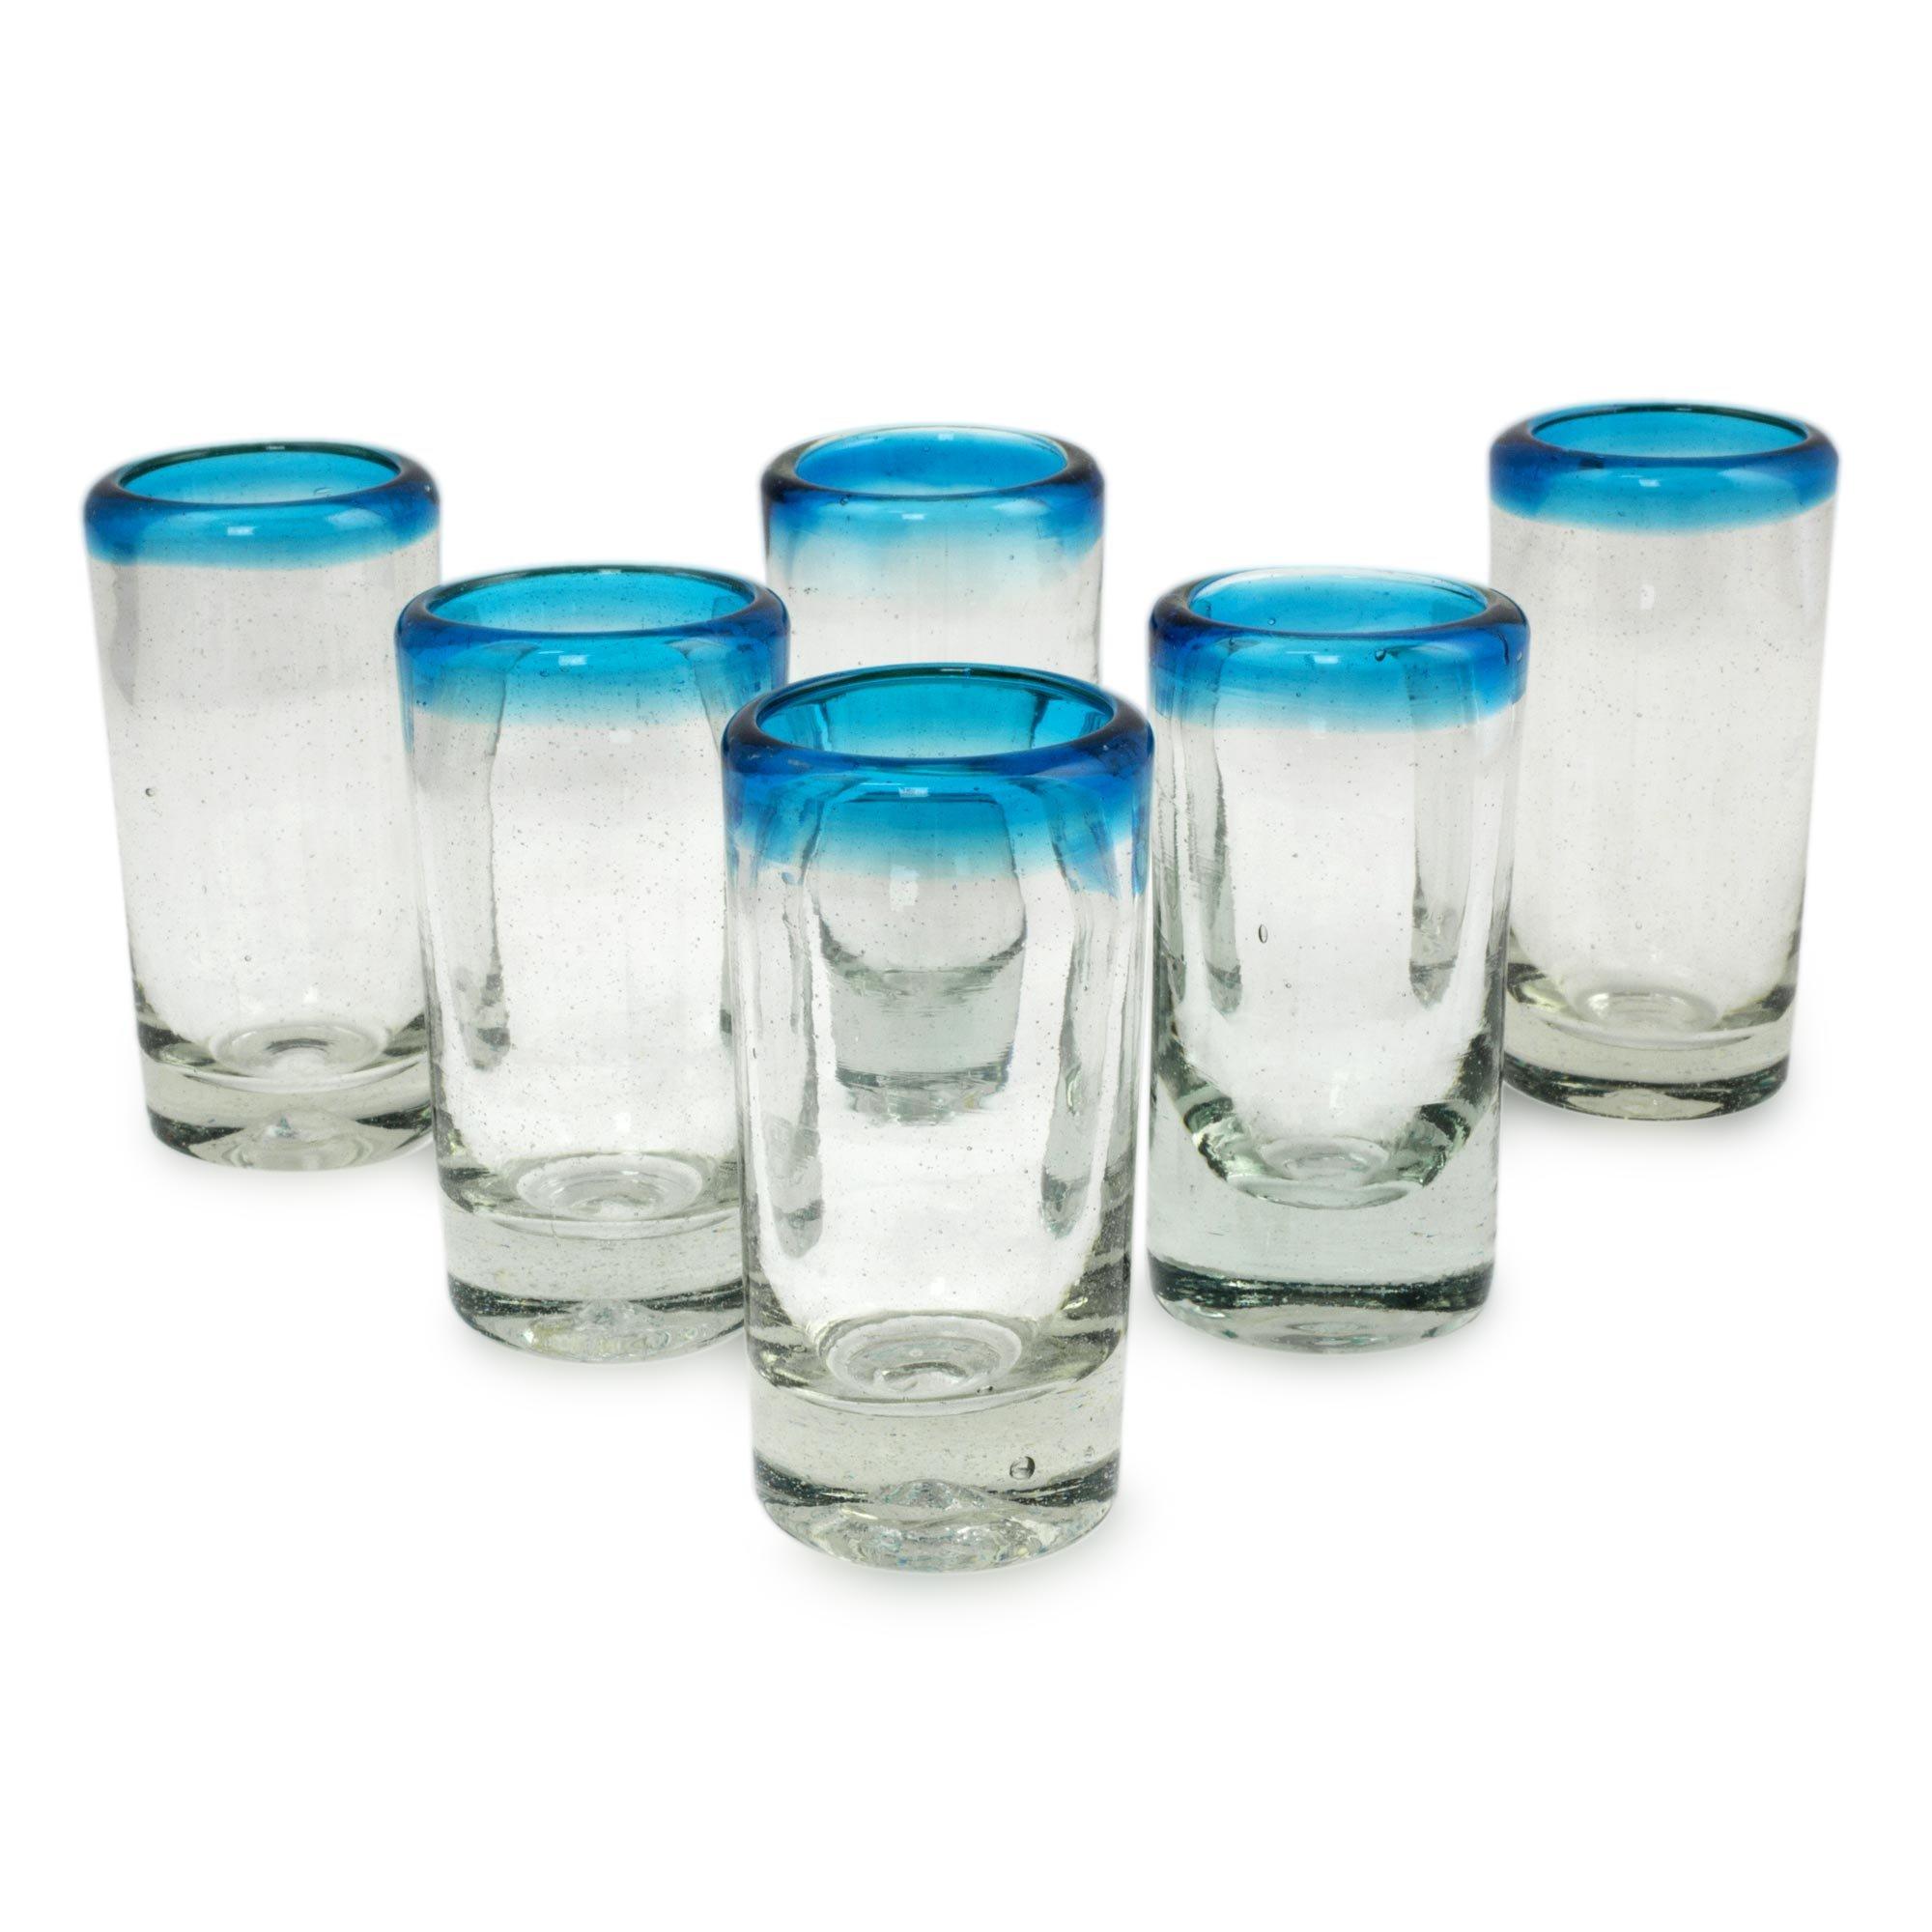 NOVICA Hand Blown Clear Blue Recycled Glass Shot Glasses, 3 oz 'Aquamarine' (set of 6)